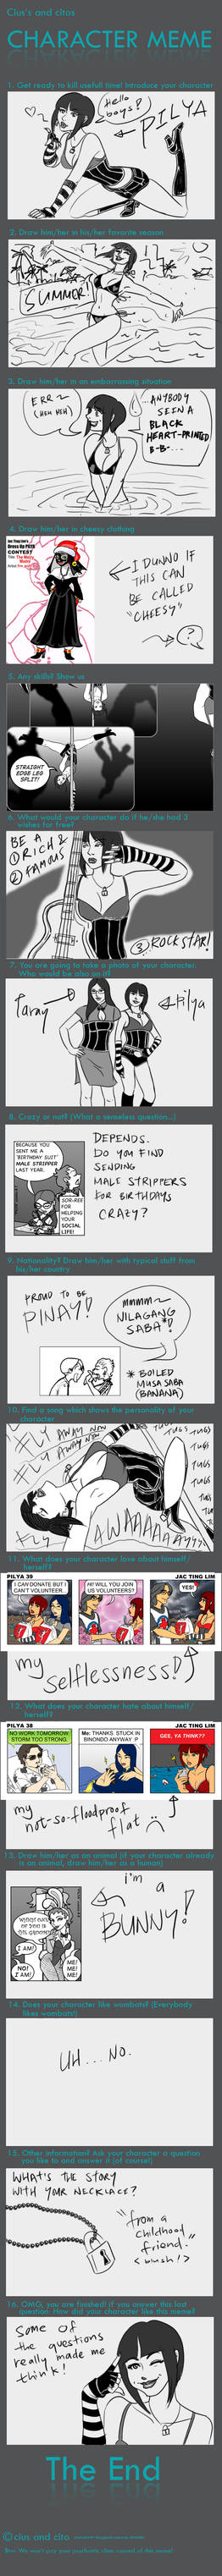 Pilya Character Meme